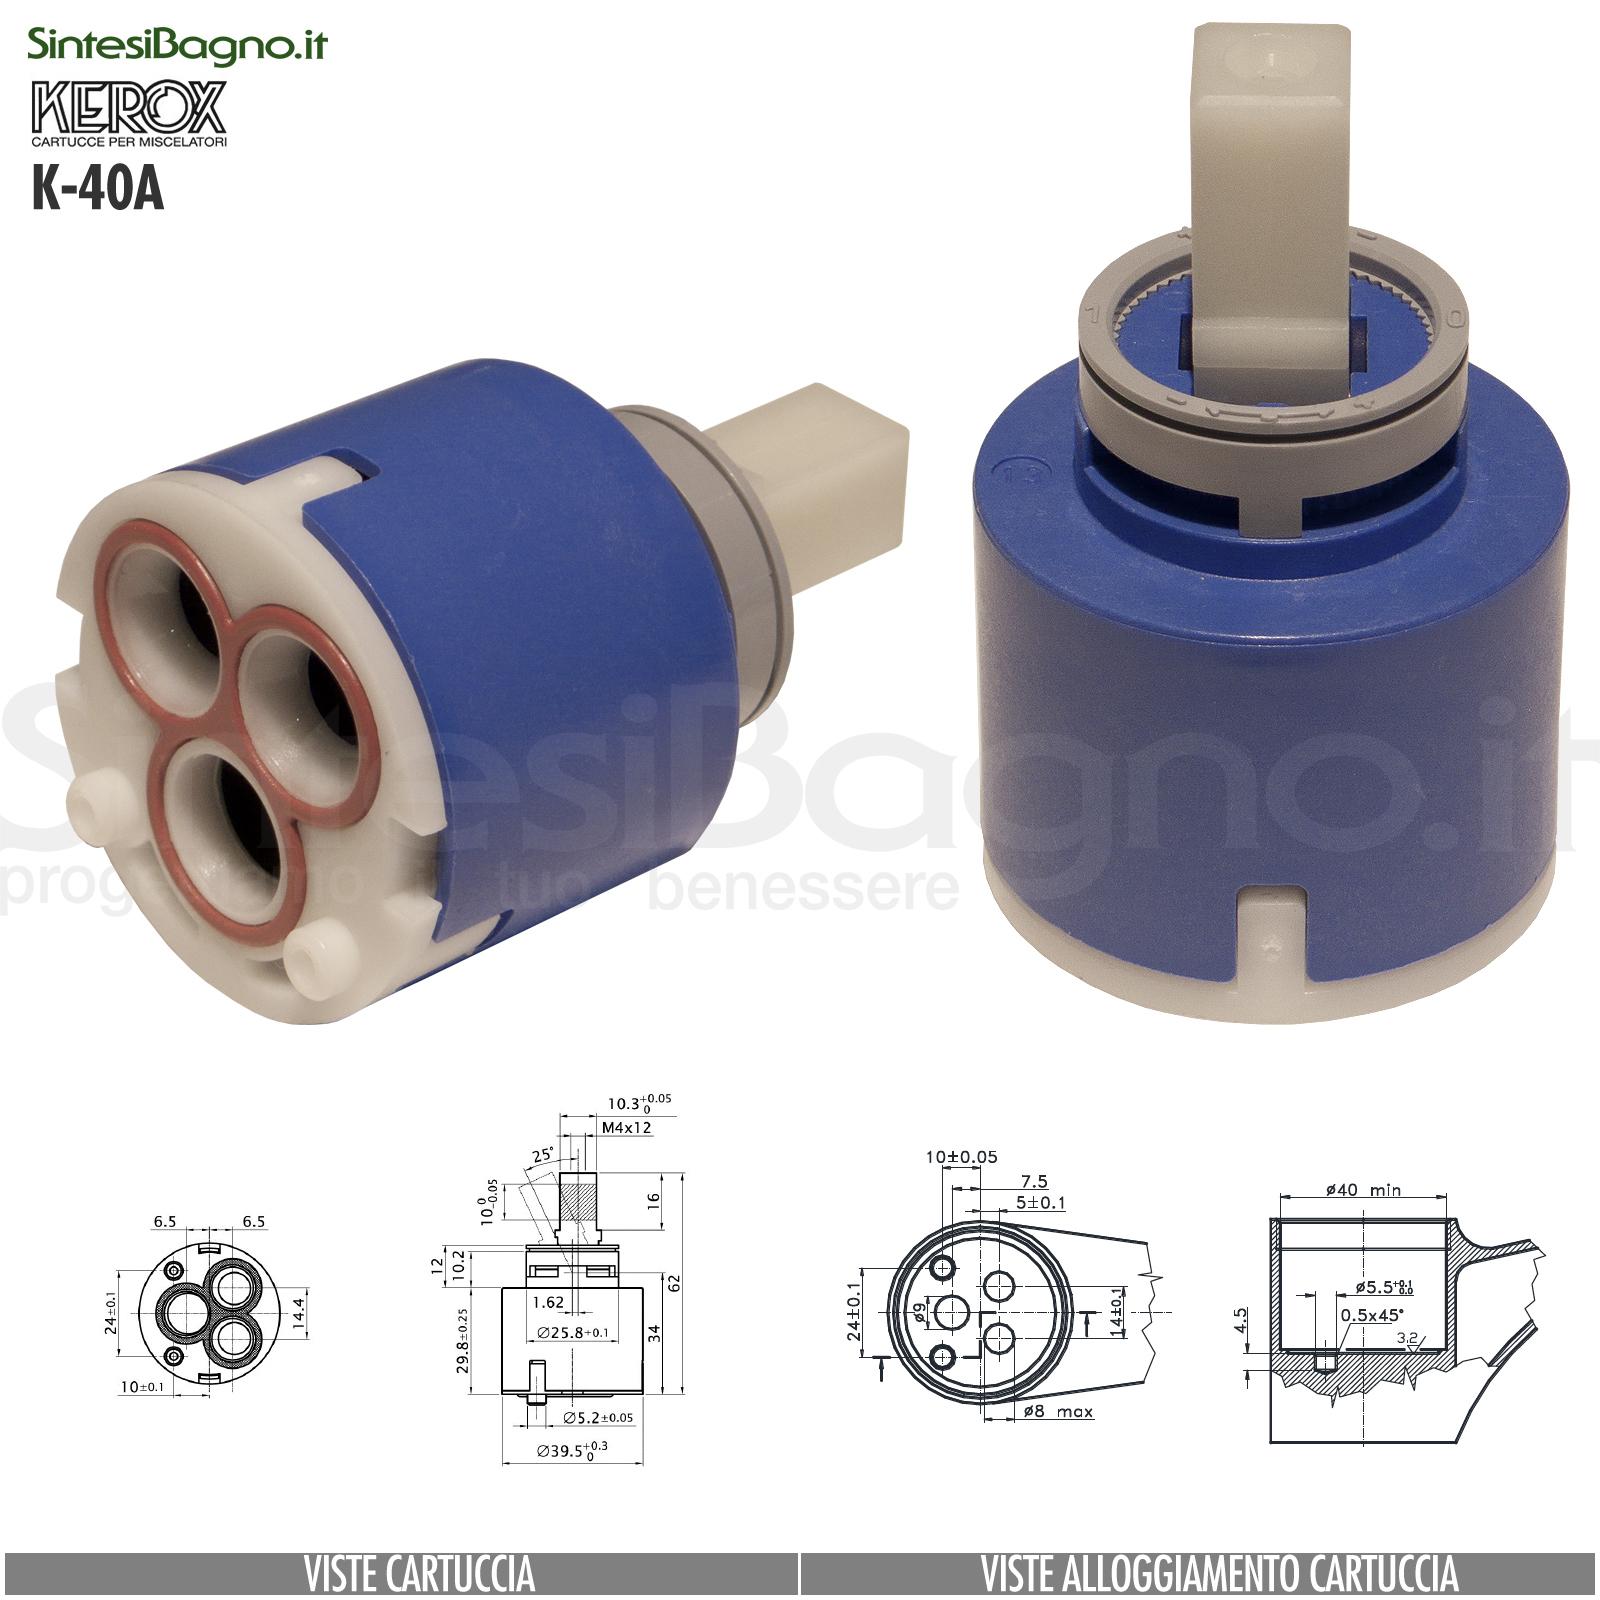 KEROX K 40 A | Cartuccia KEROX K-40A di ricambio per miscelatore monocomando Ø 40 mm